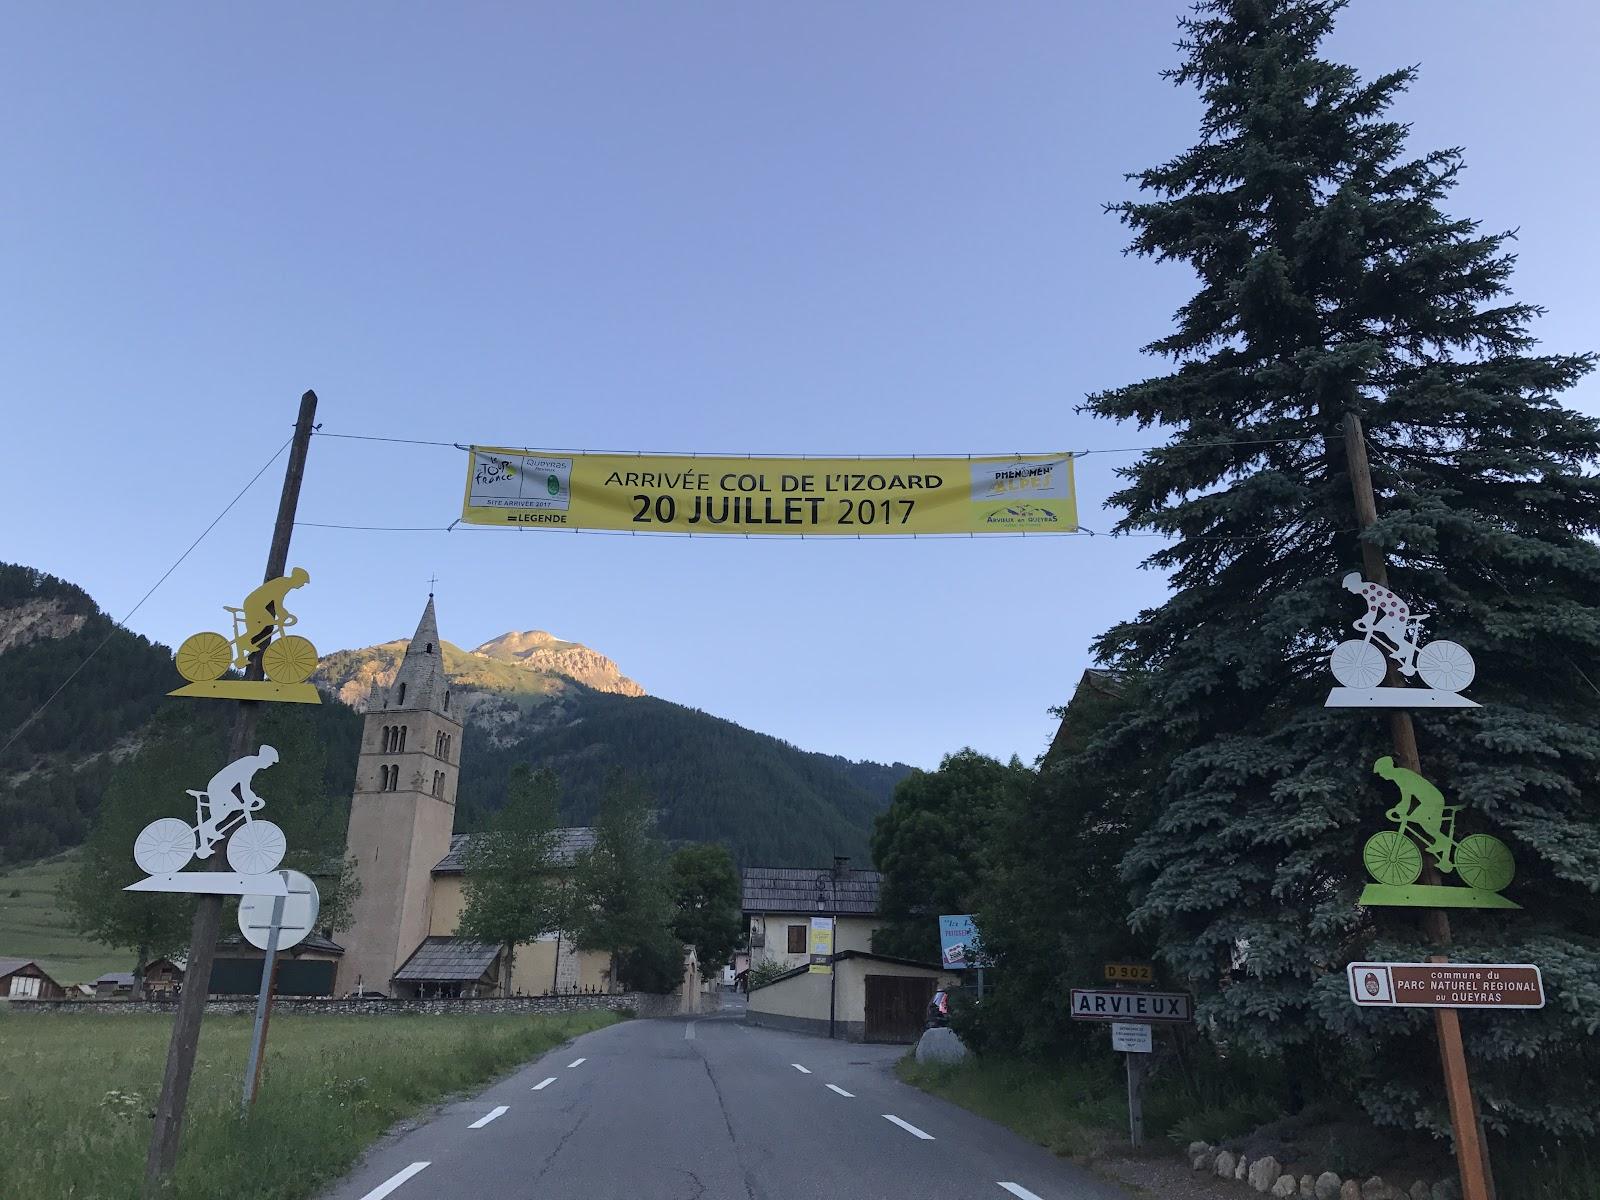 Cycling Col d'Izoard Guillestre Tour de France signs and banners